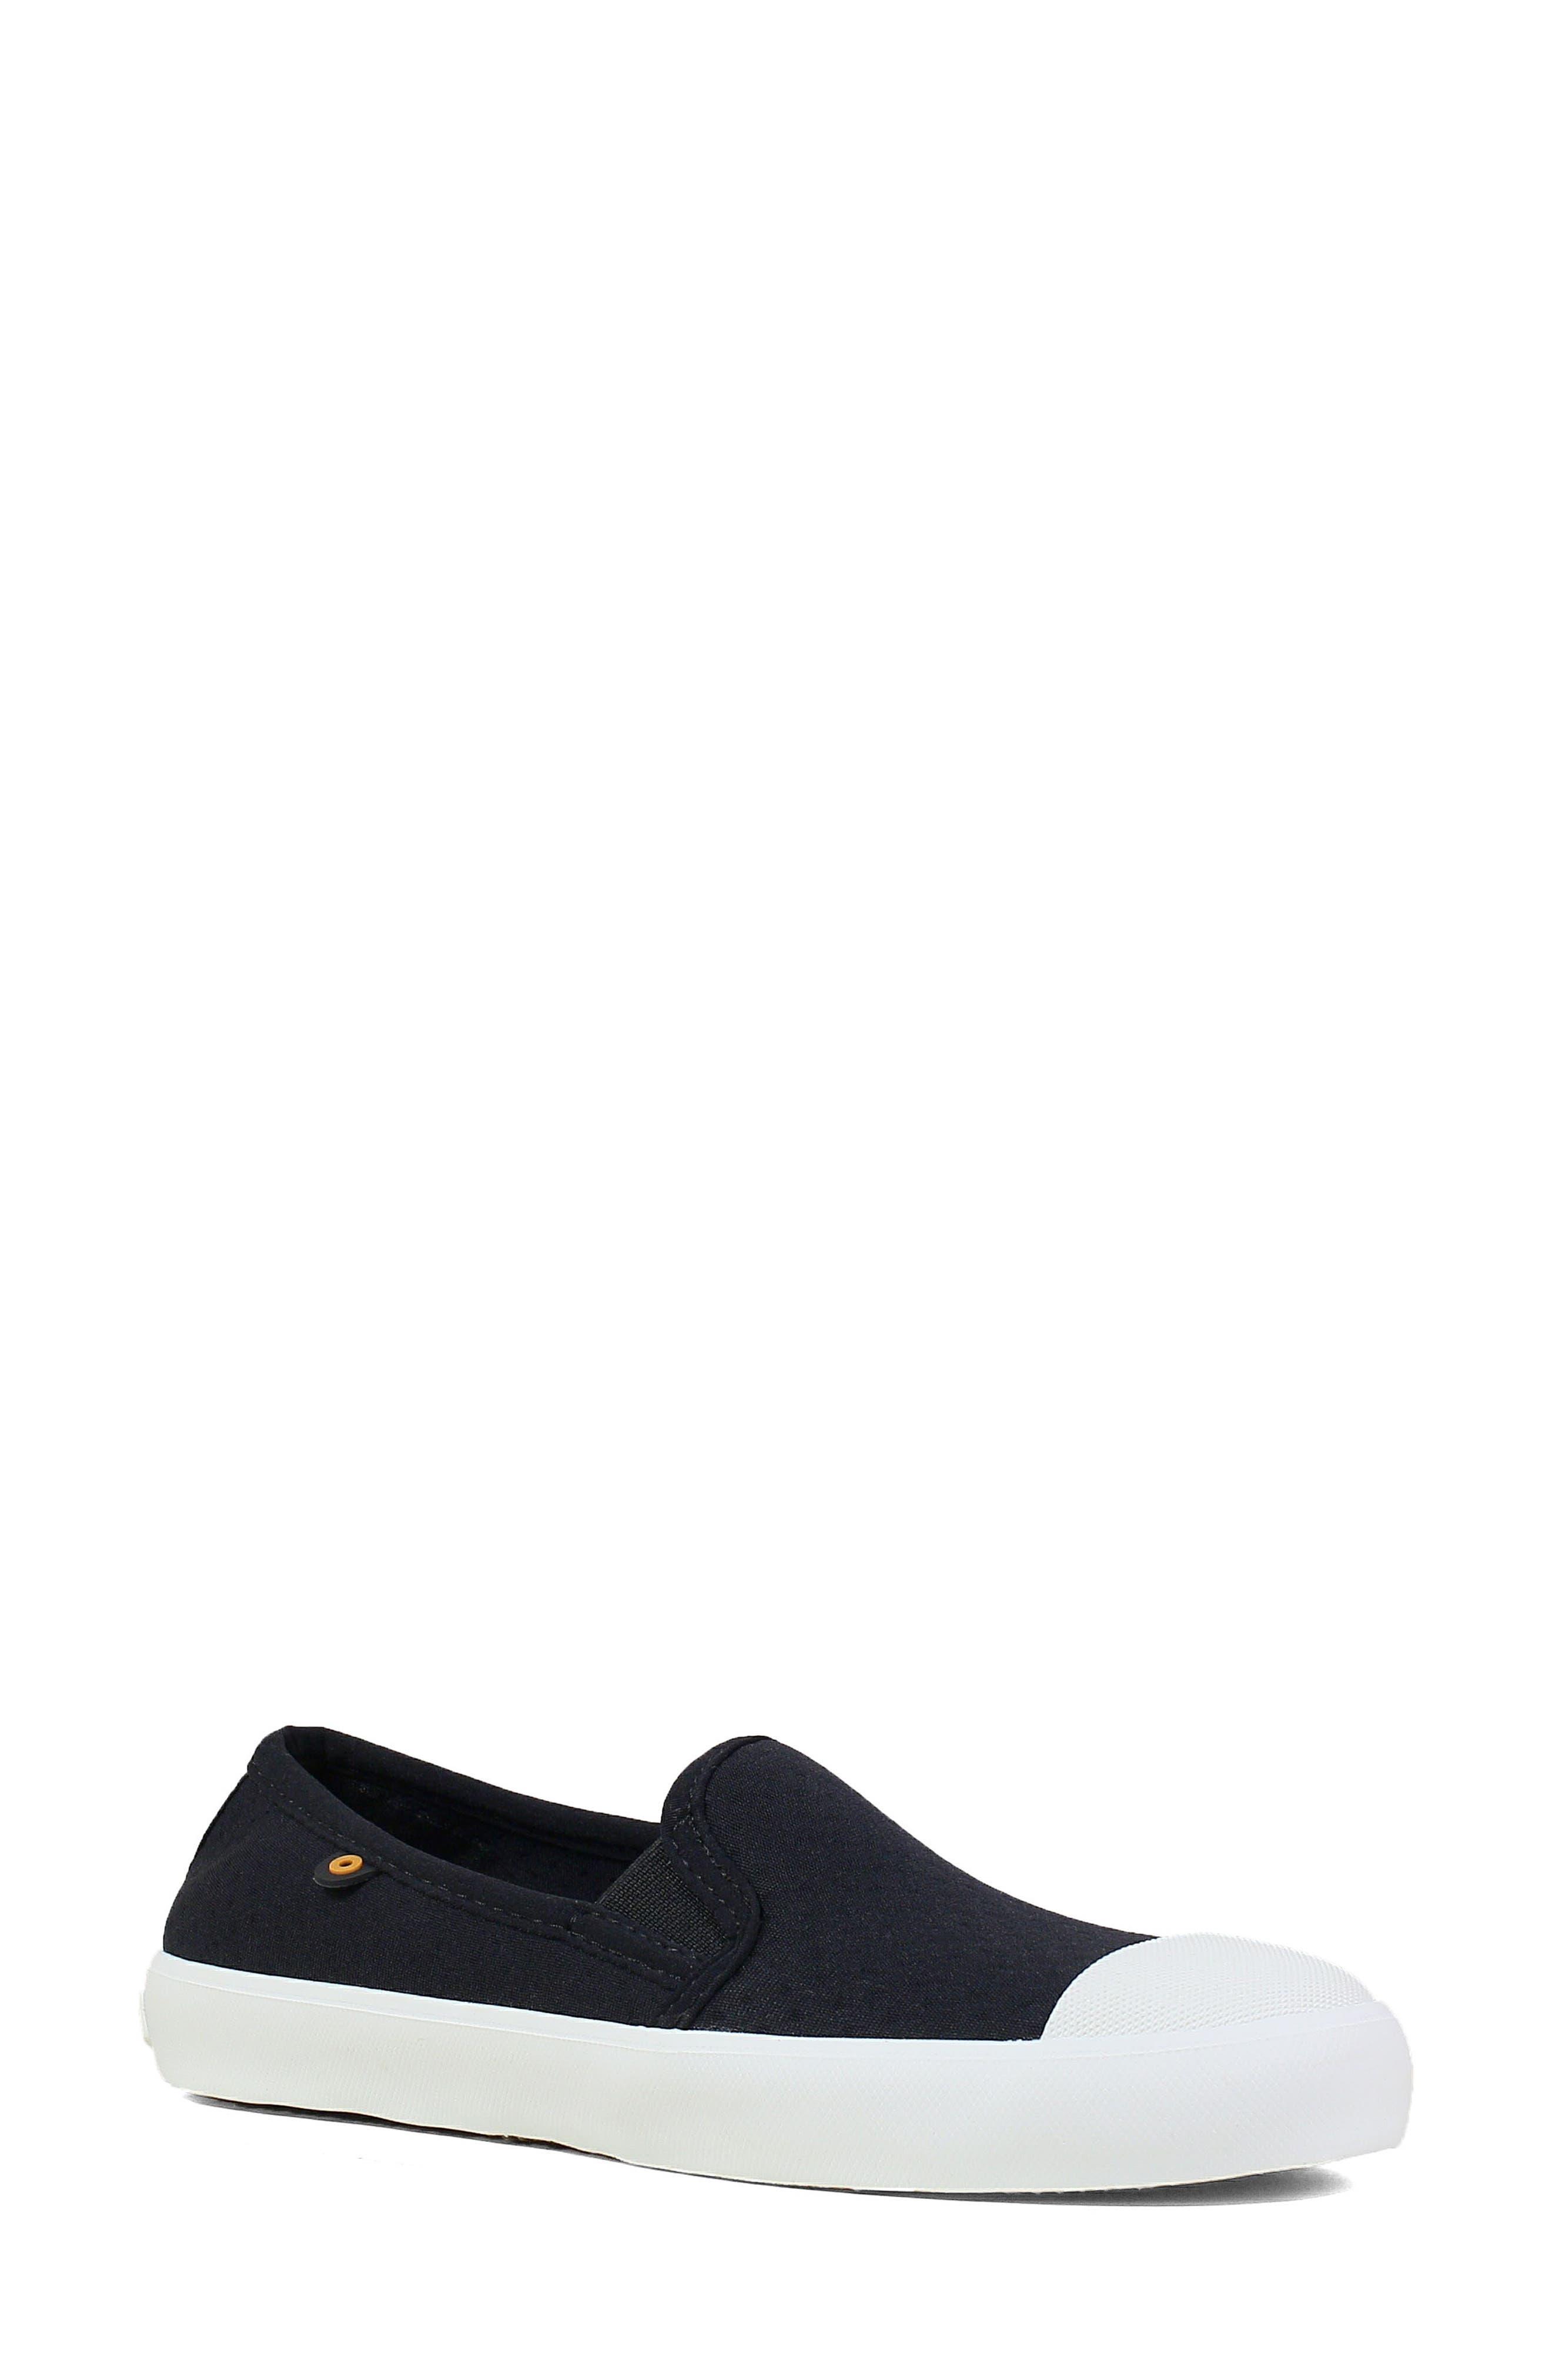 Kicker Slip-On Sneaker, Main, color, BLACK CANVAS